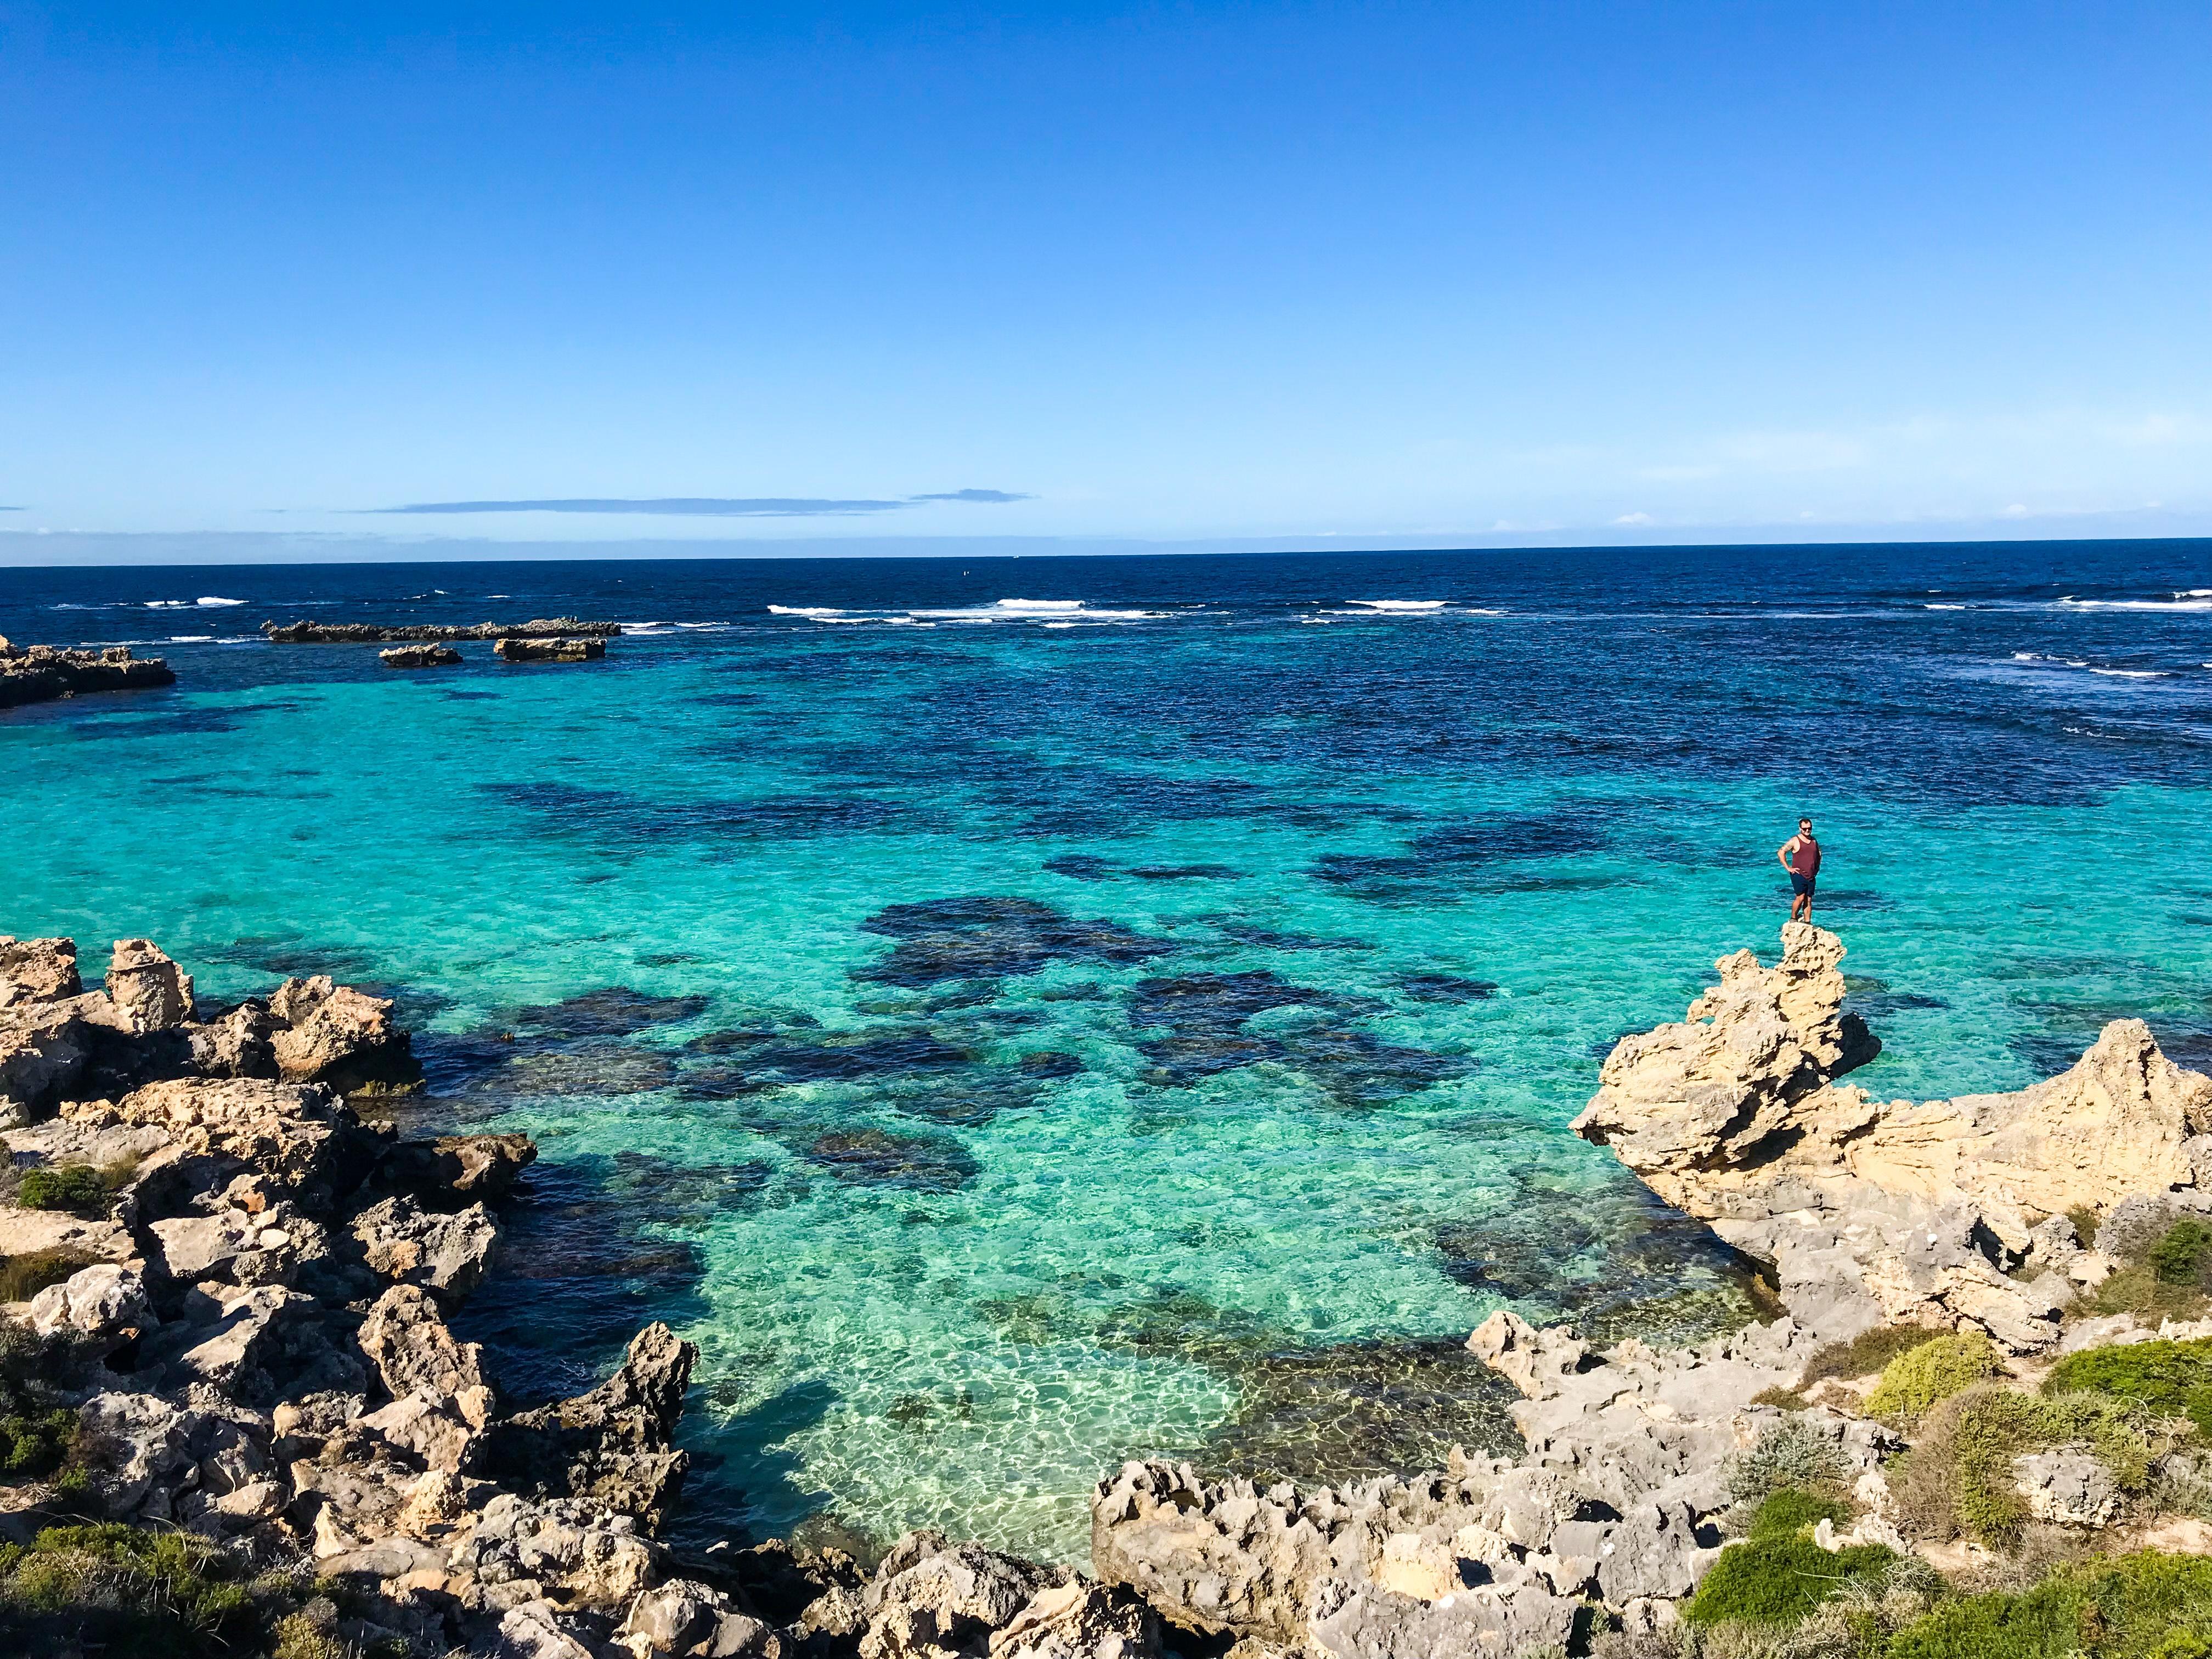 Parker Point Road. View tips & tricks for exploring Rottnest Island with Spirit Quest Travel www.spiritquesttravel.com.au